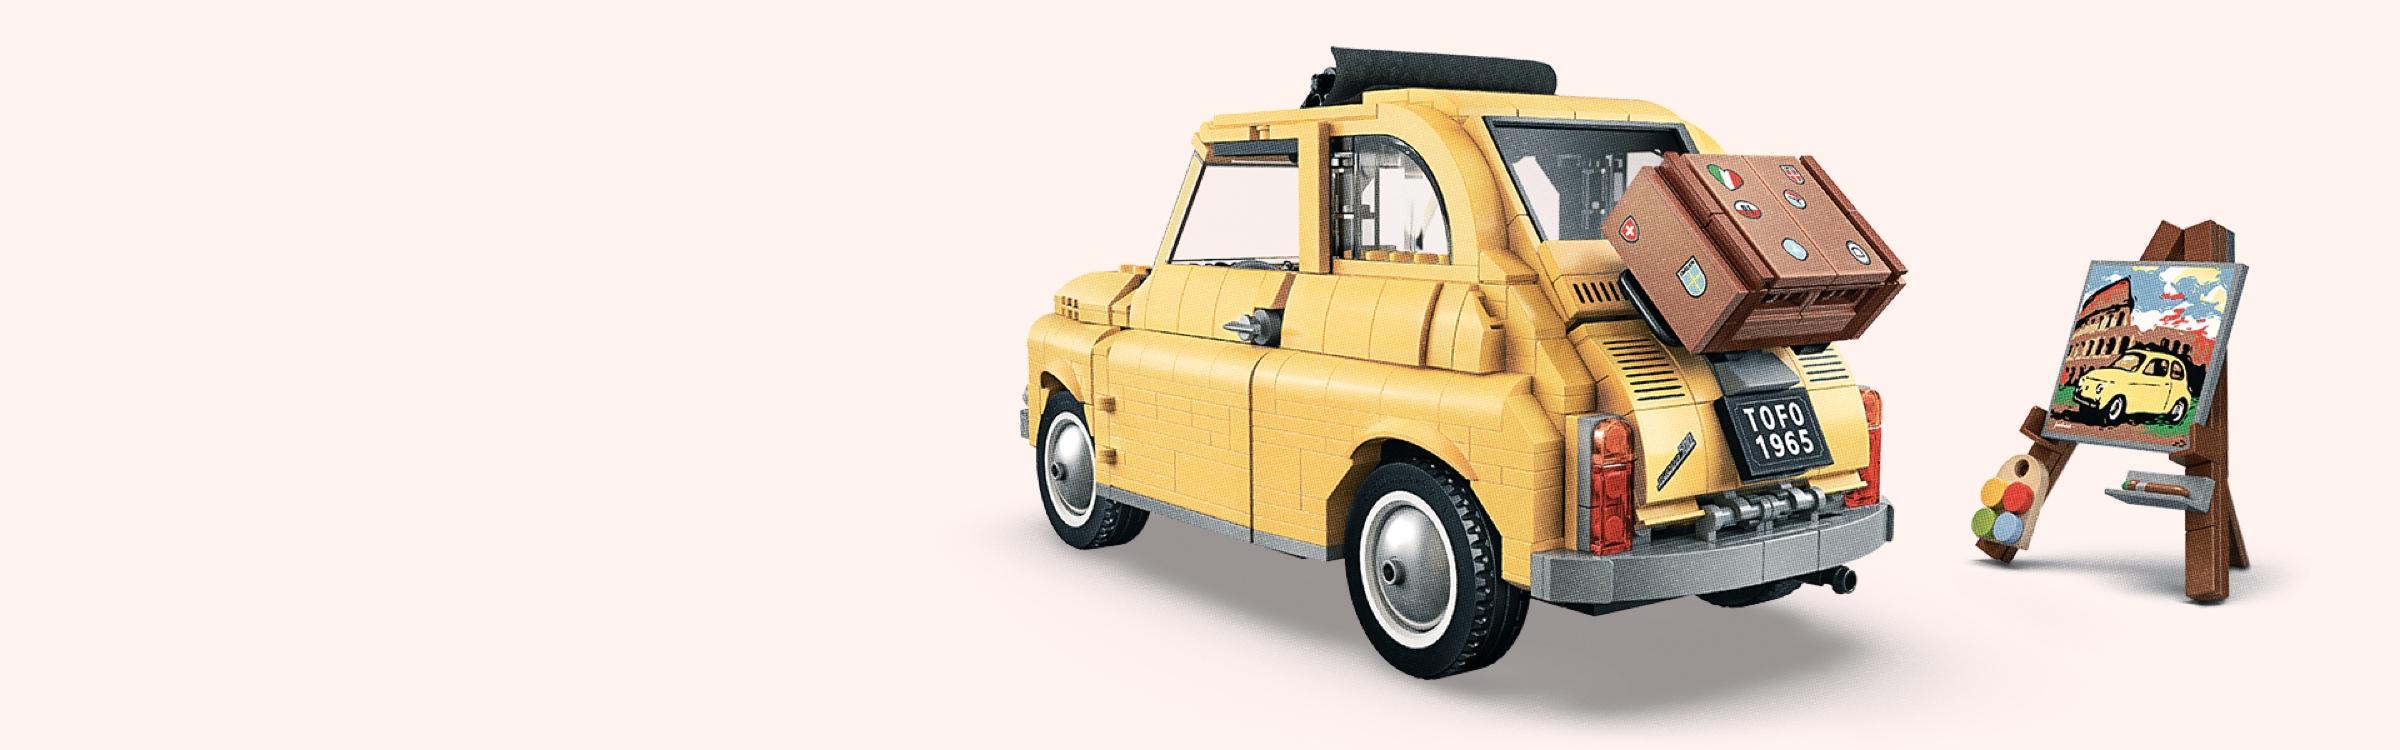 10271 Fiat 202003 PDP Hero Standard Large Lego Fiat 500